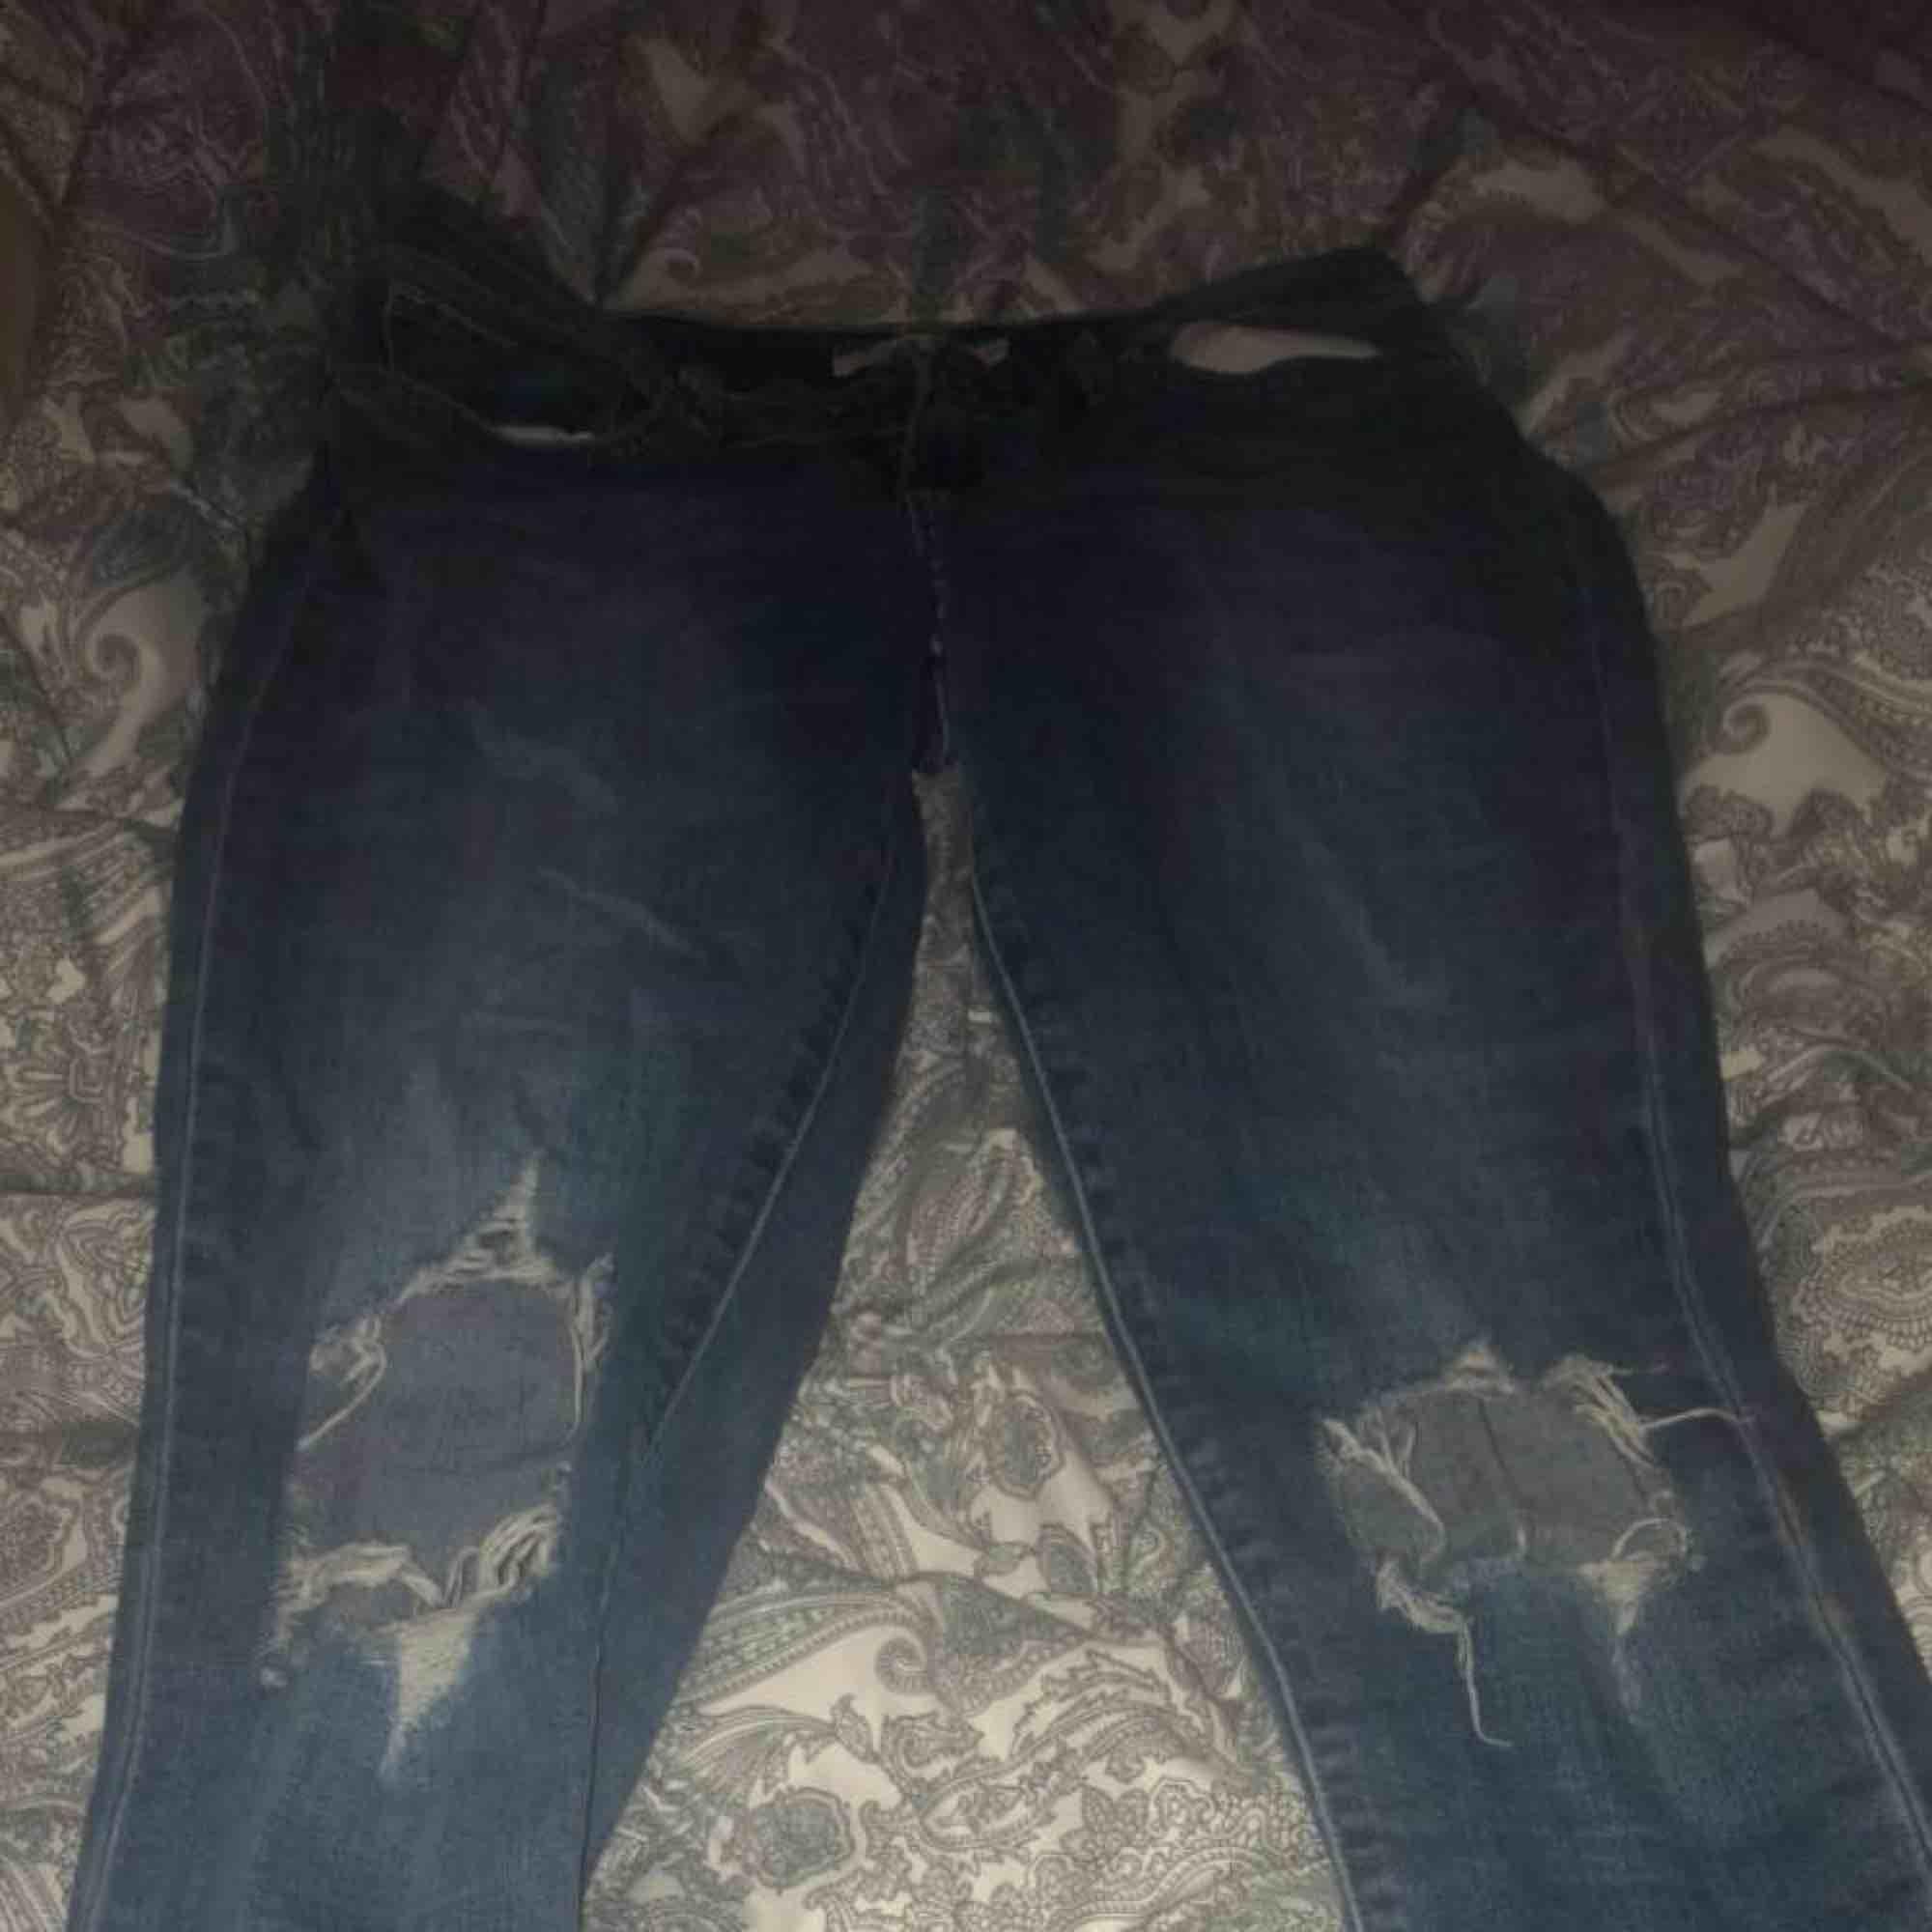 Storlekarna står på bilden vet dock inte vilken de motsvarar men skulle gissa på S/M. Jeans & Byxor.